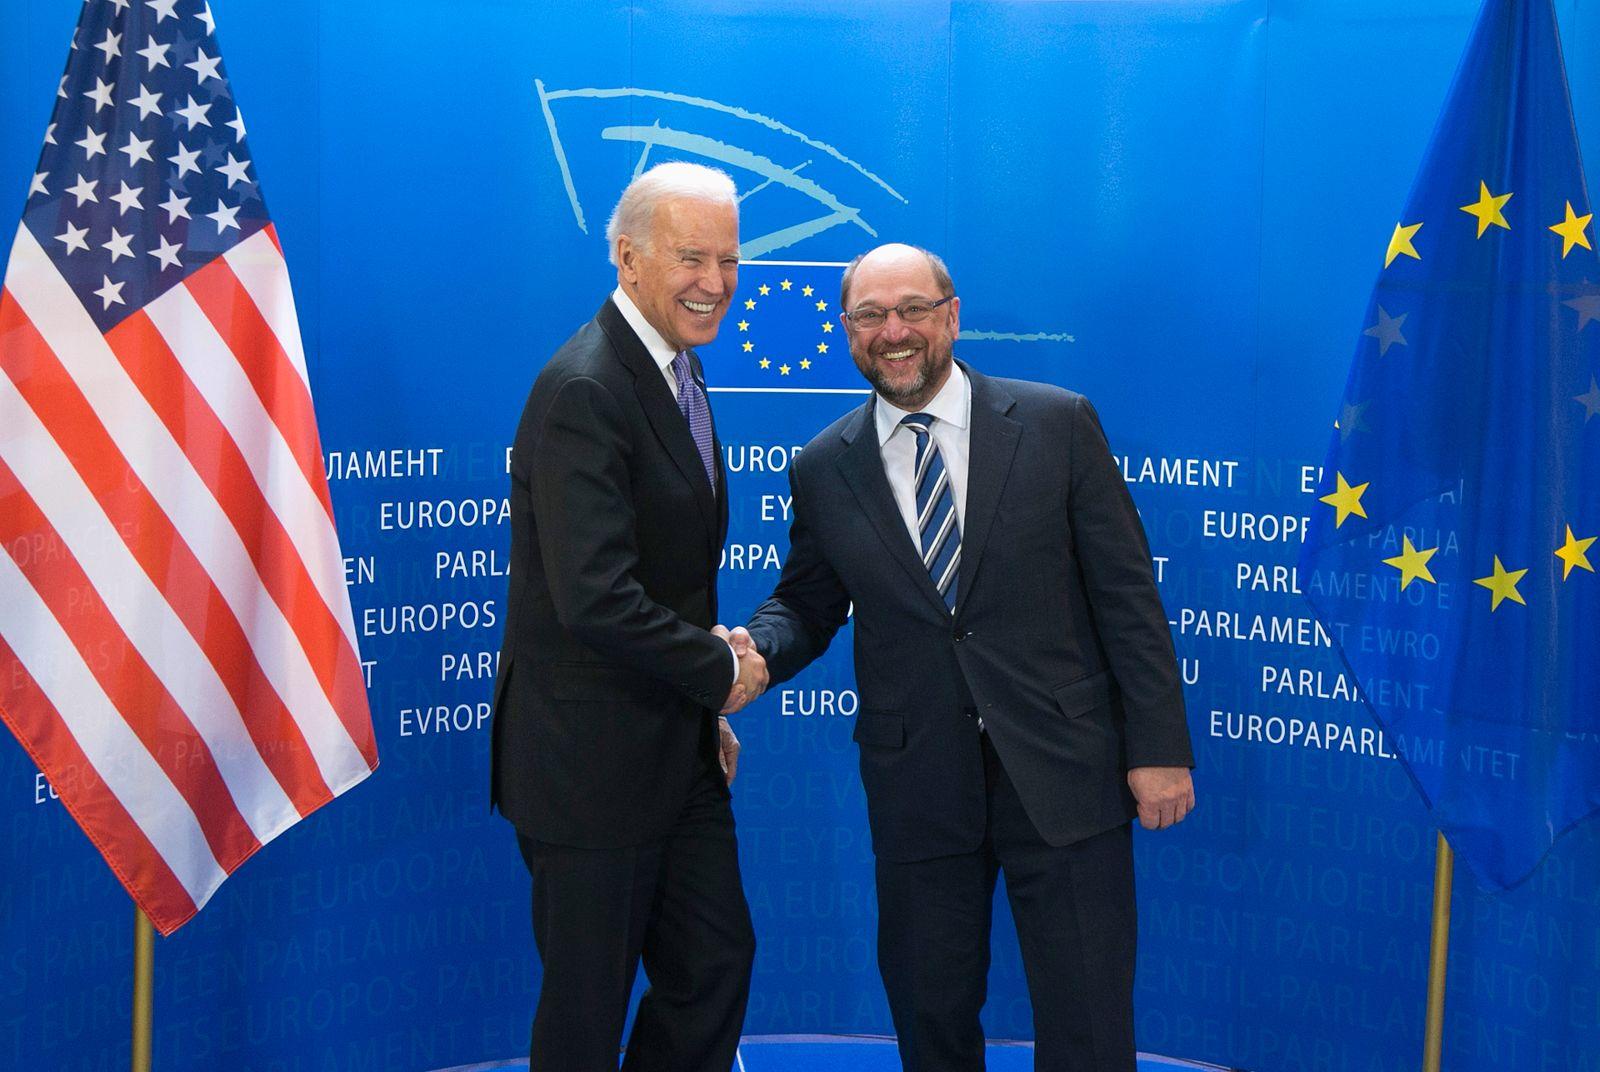 European Parliament President Schulz welcomes U.S. Vice President Biden at the EU Parliament headquarters in Brussels